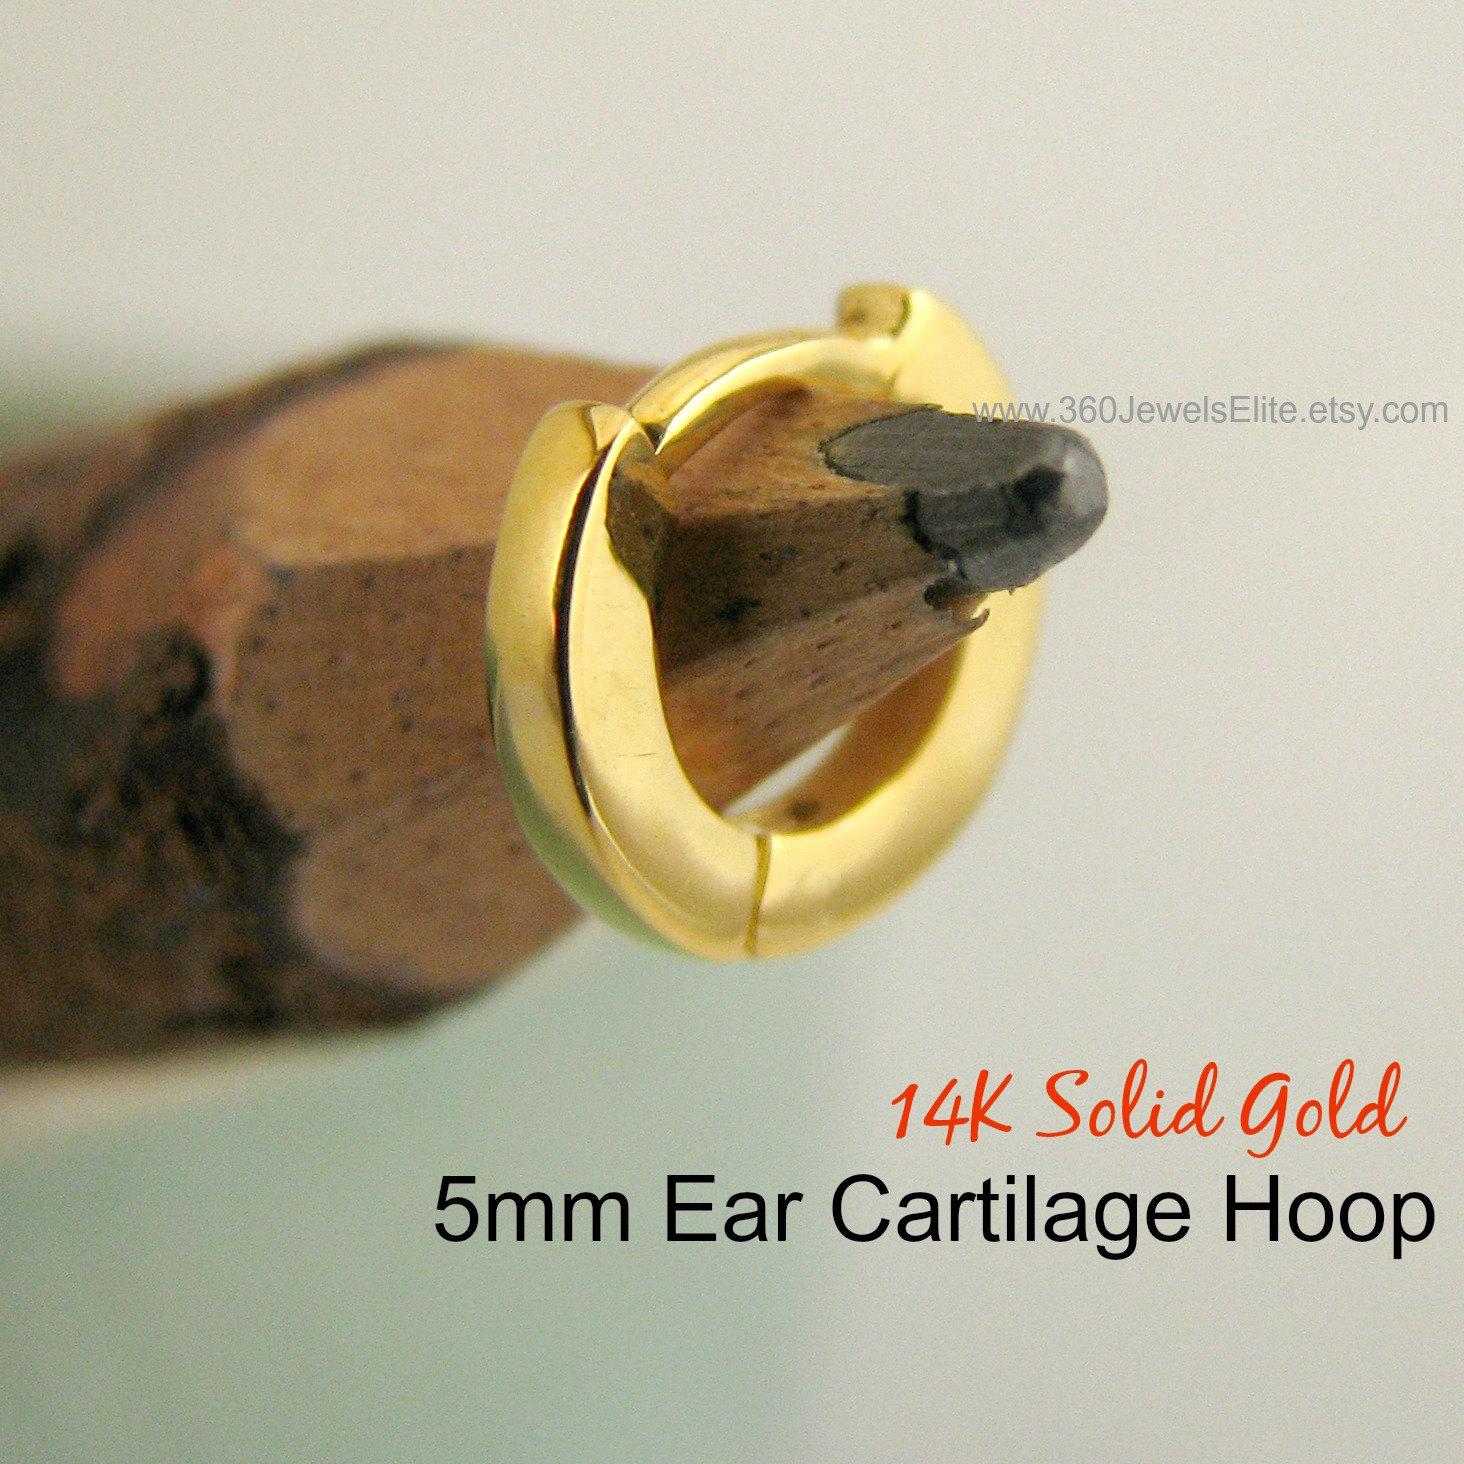 Cartilage earring aurora combustion cartilage hoop earring